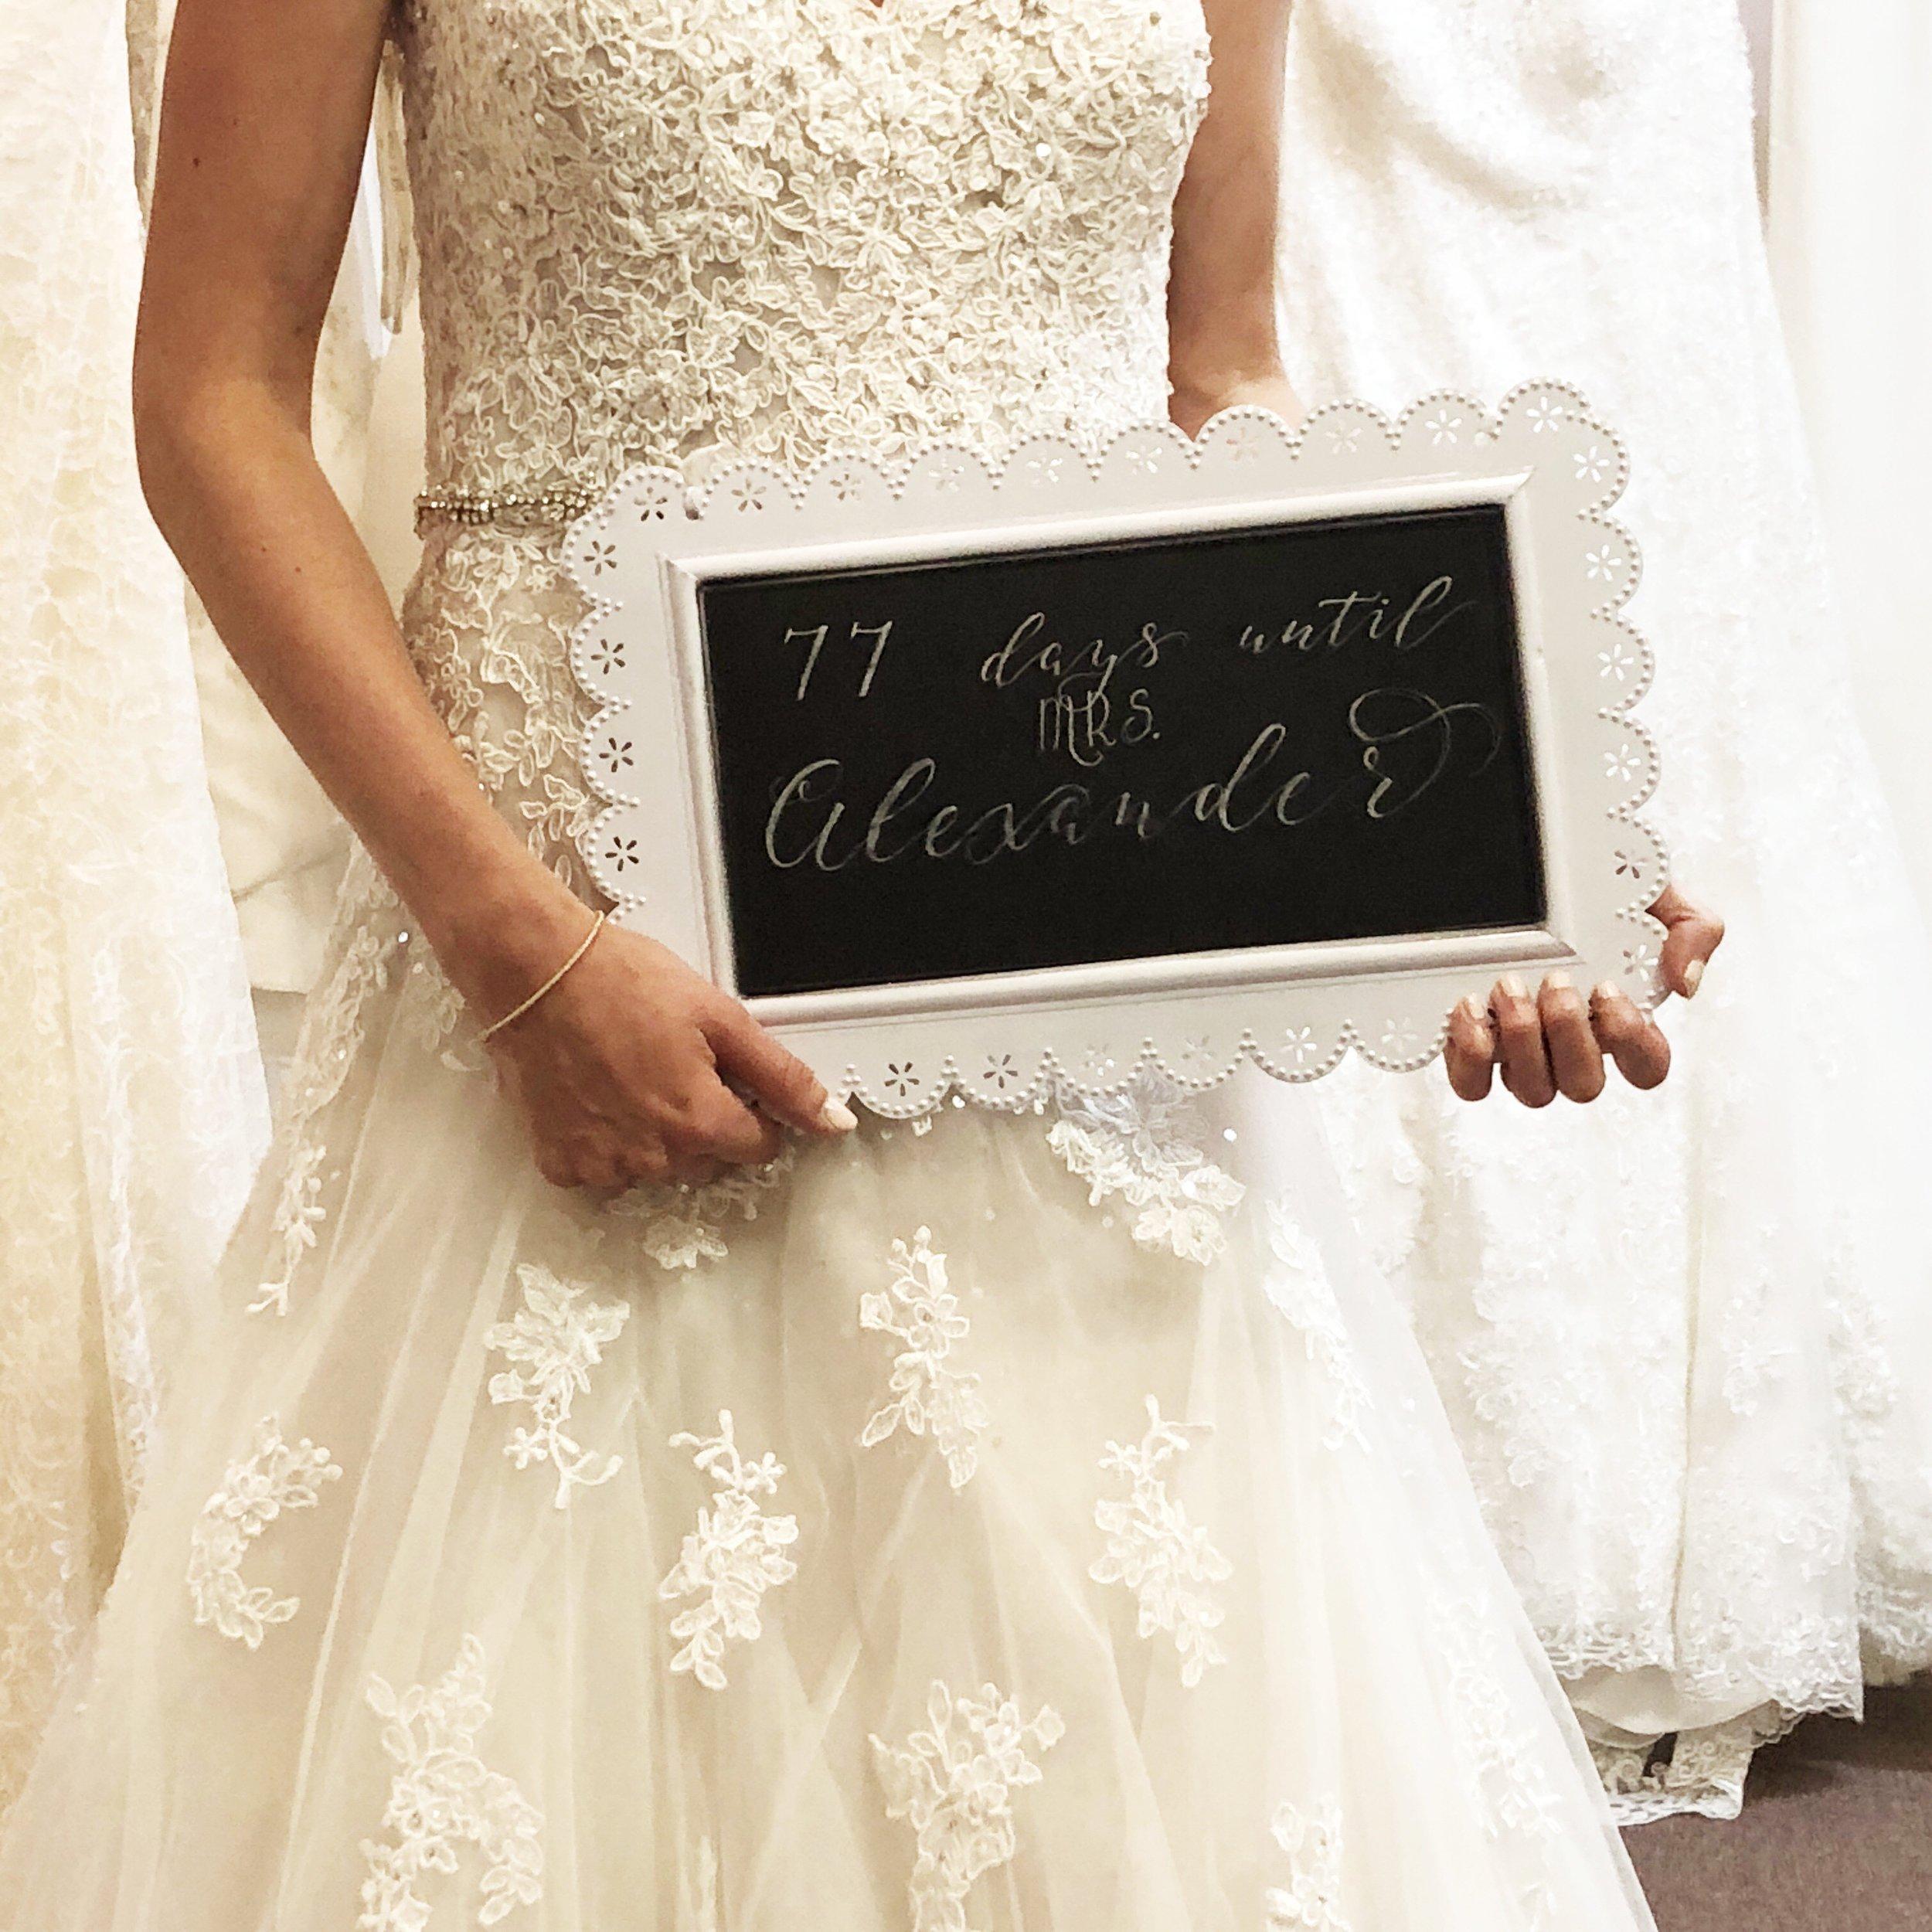 Central PA, York PA, JesSmith Designs, custom, wedding, invitations, bridal, Harrisburg, hanover, calligraphy, baltimore, wedding invitations, lancaster, gettysburg, 07-21 12.28.47.jpg